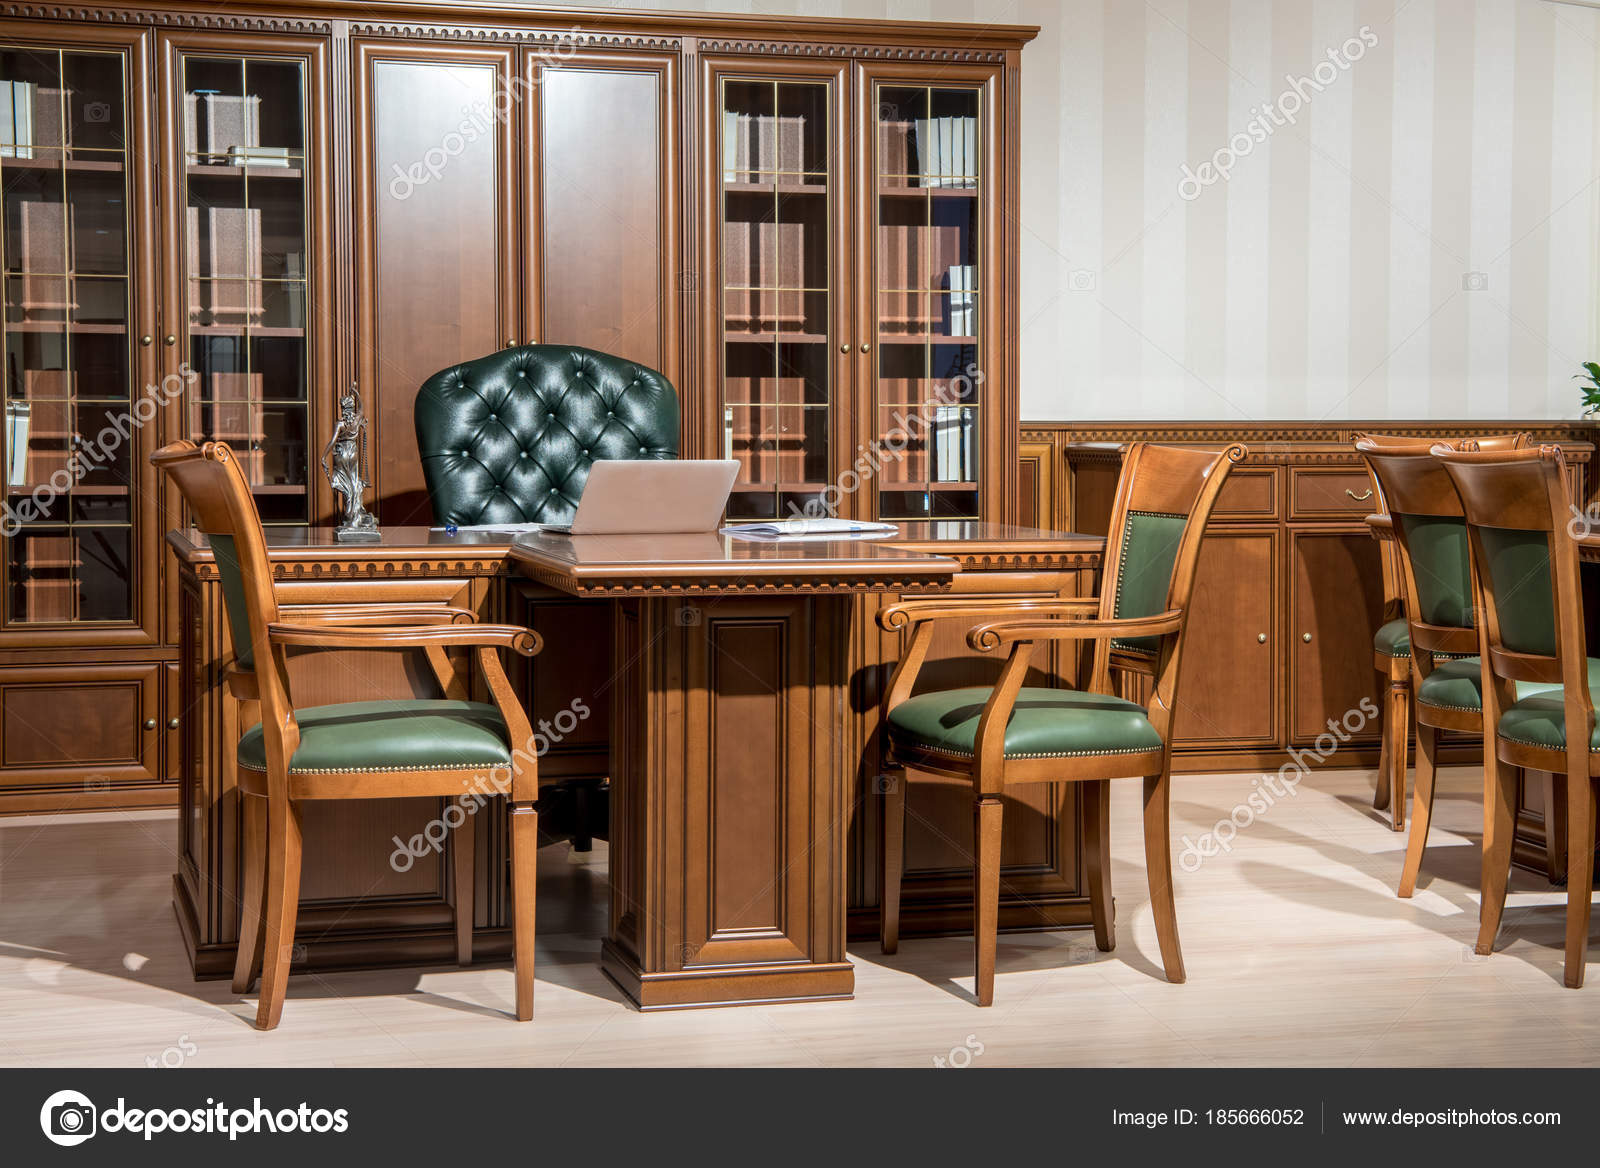 Interior Office Room Chairs Laptop Wooden Table Classic Design Stock Photo C Vitalikradko 185666052